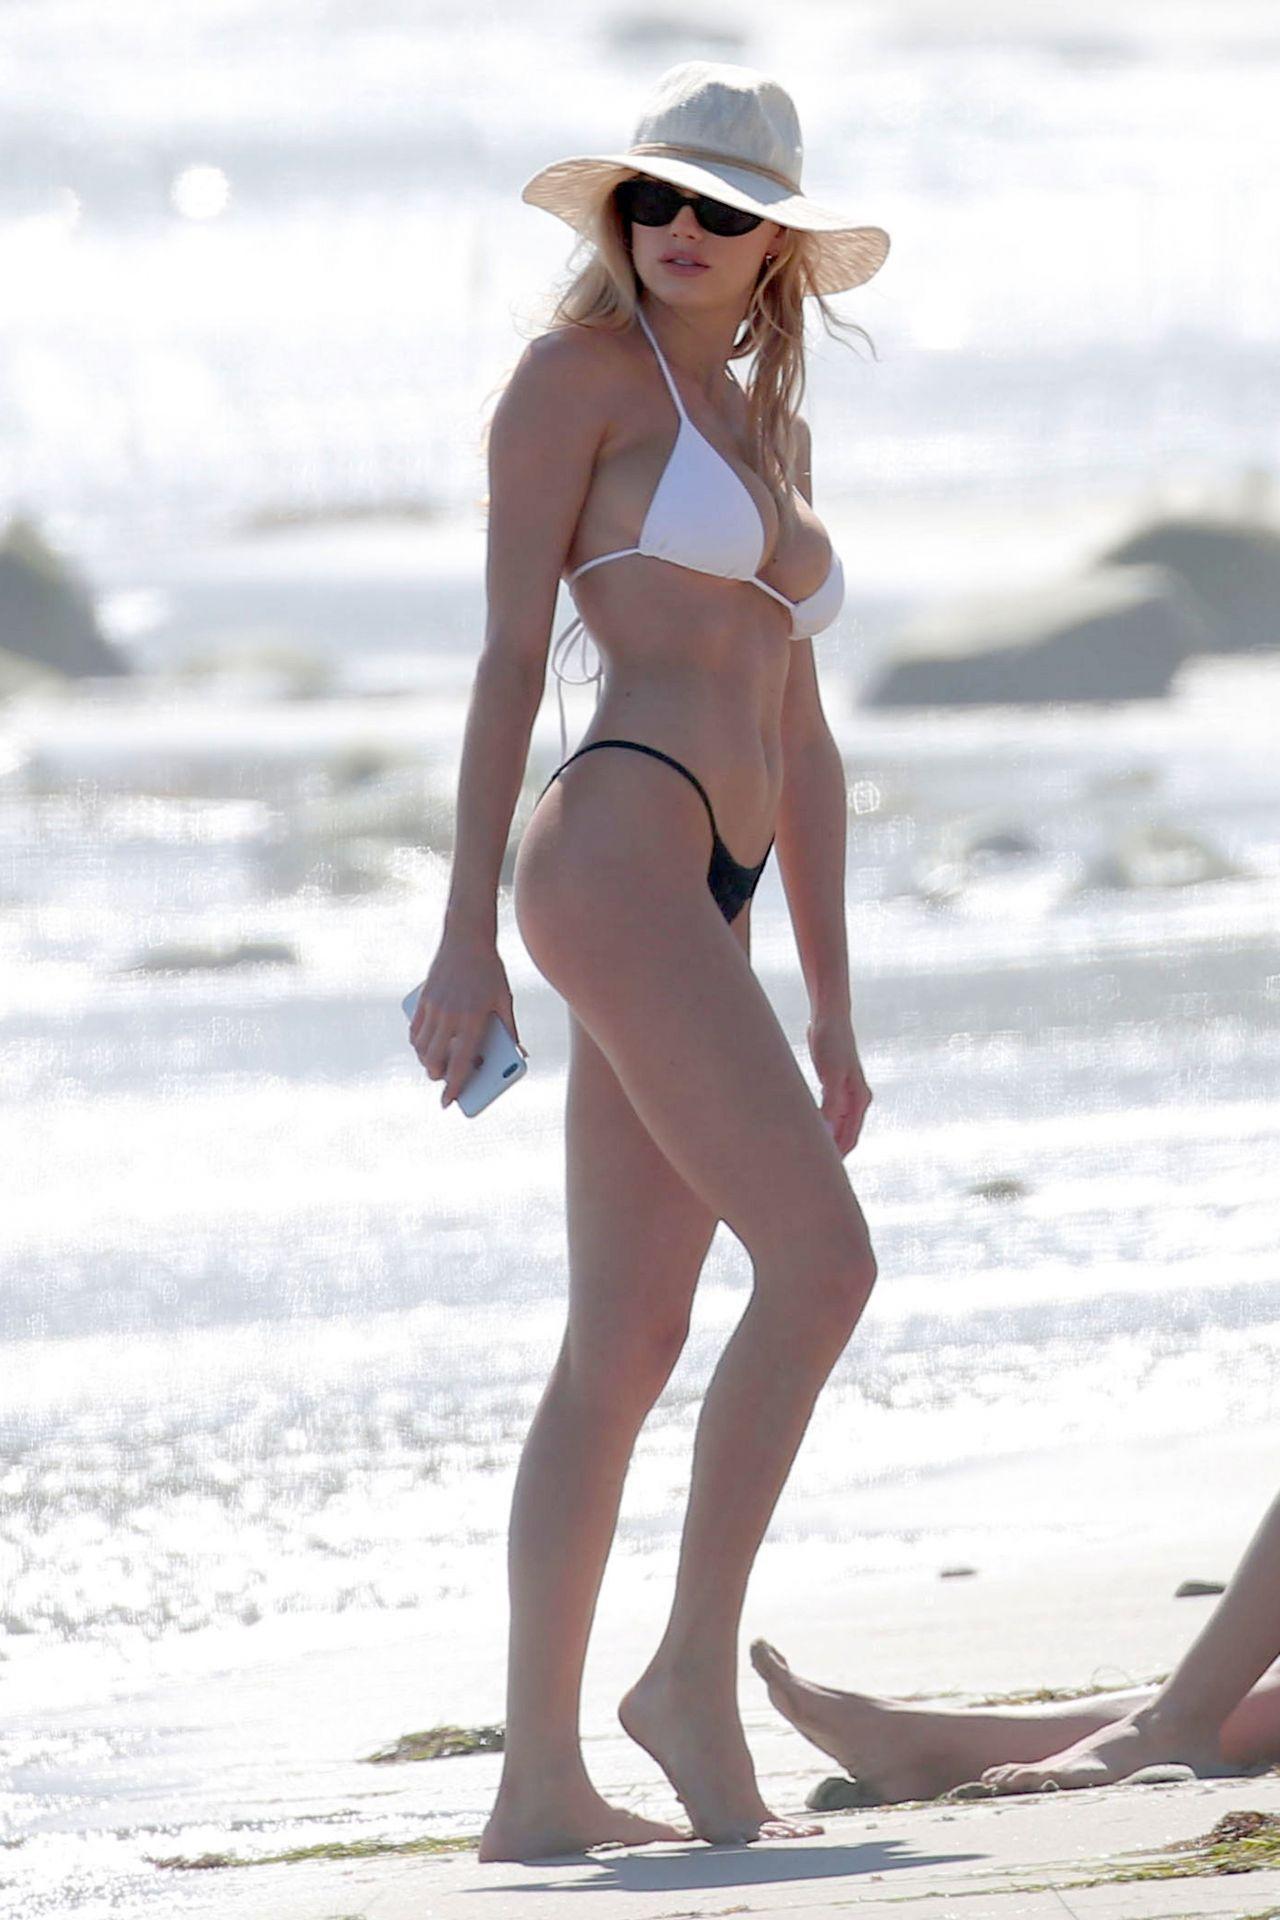 c6067ef801c50 Charlotte McKinney Hot in Bikini – Beach in LA 05 29 2017 ...